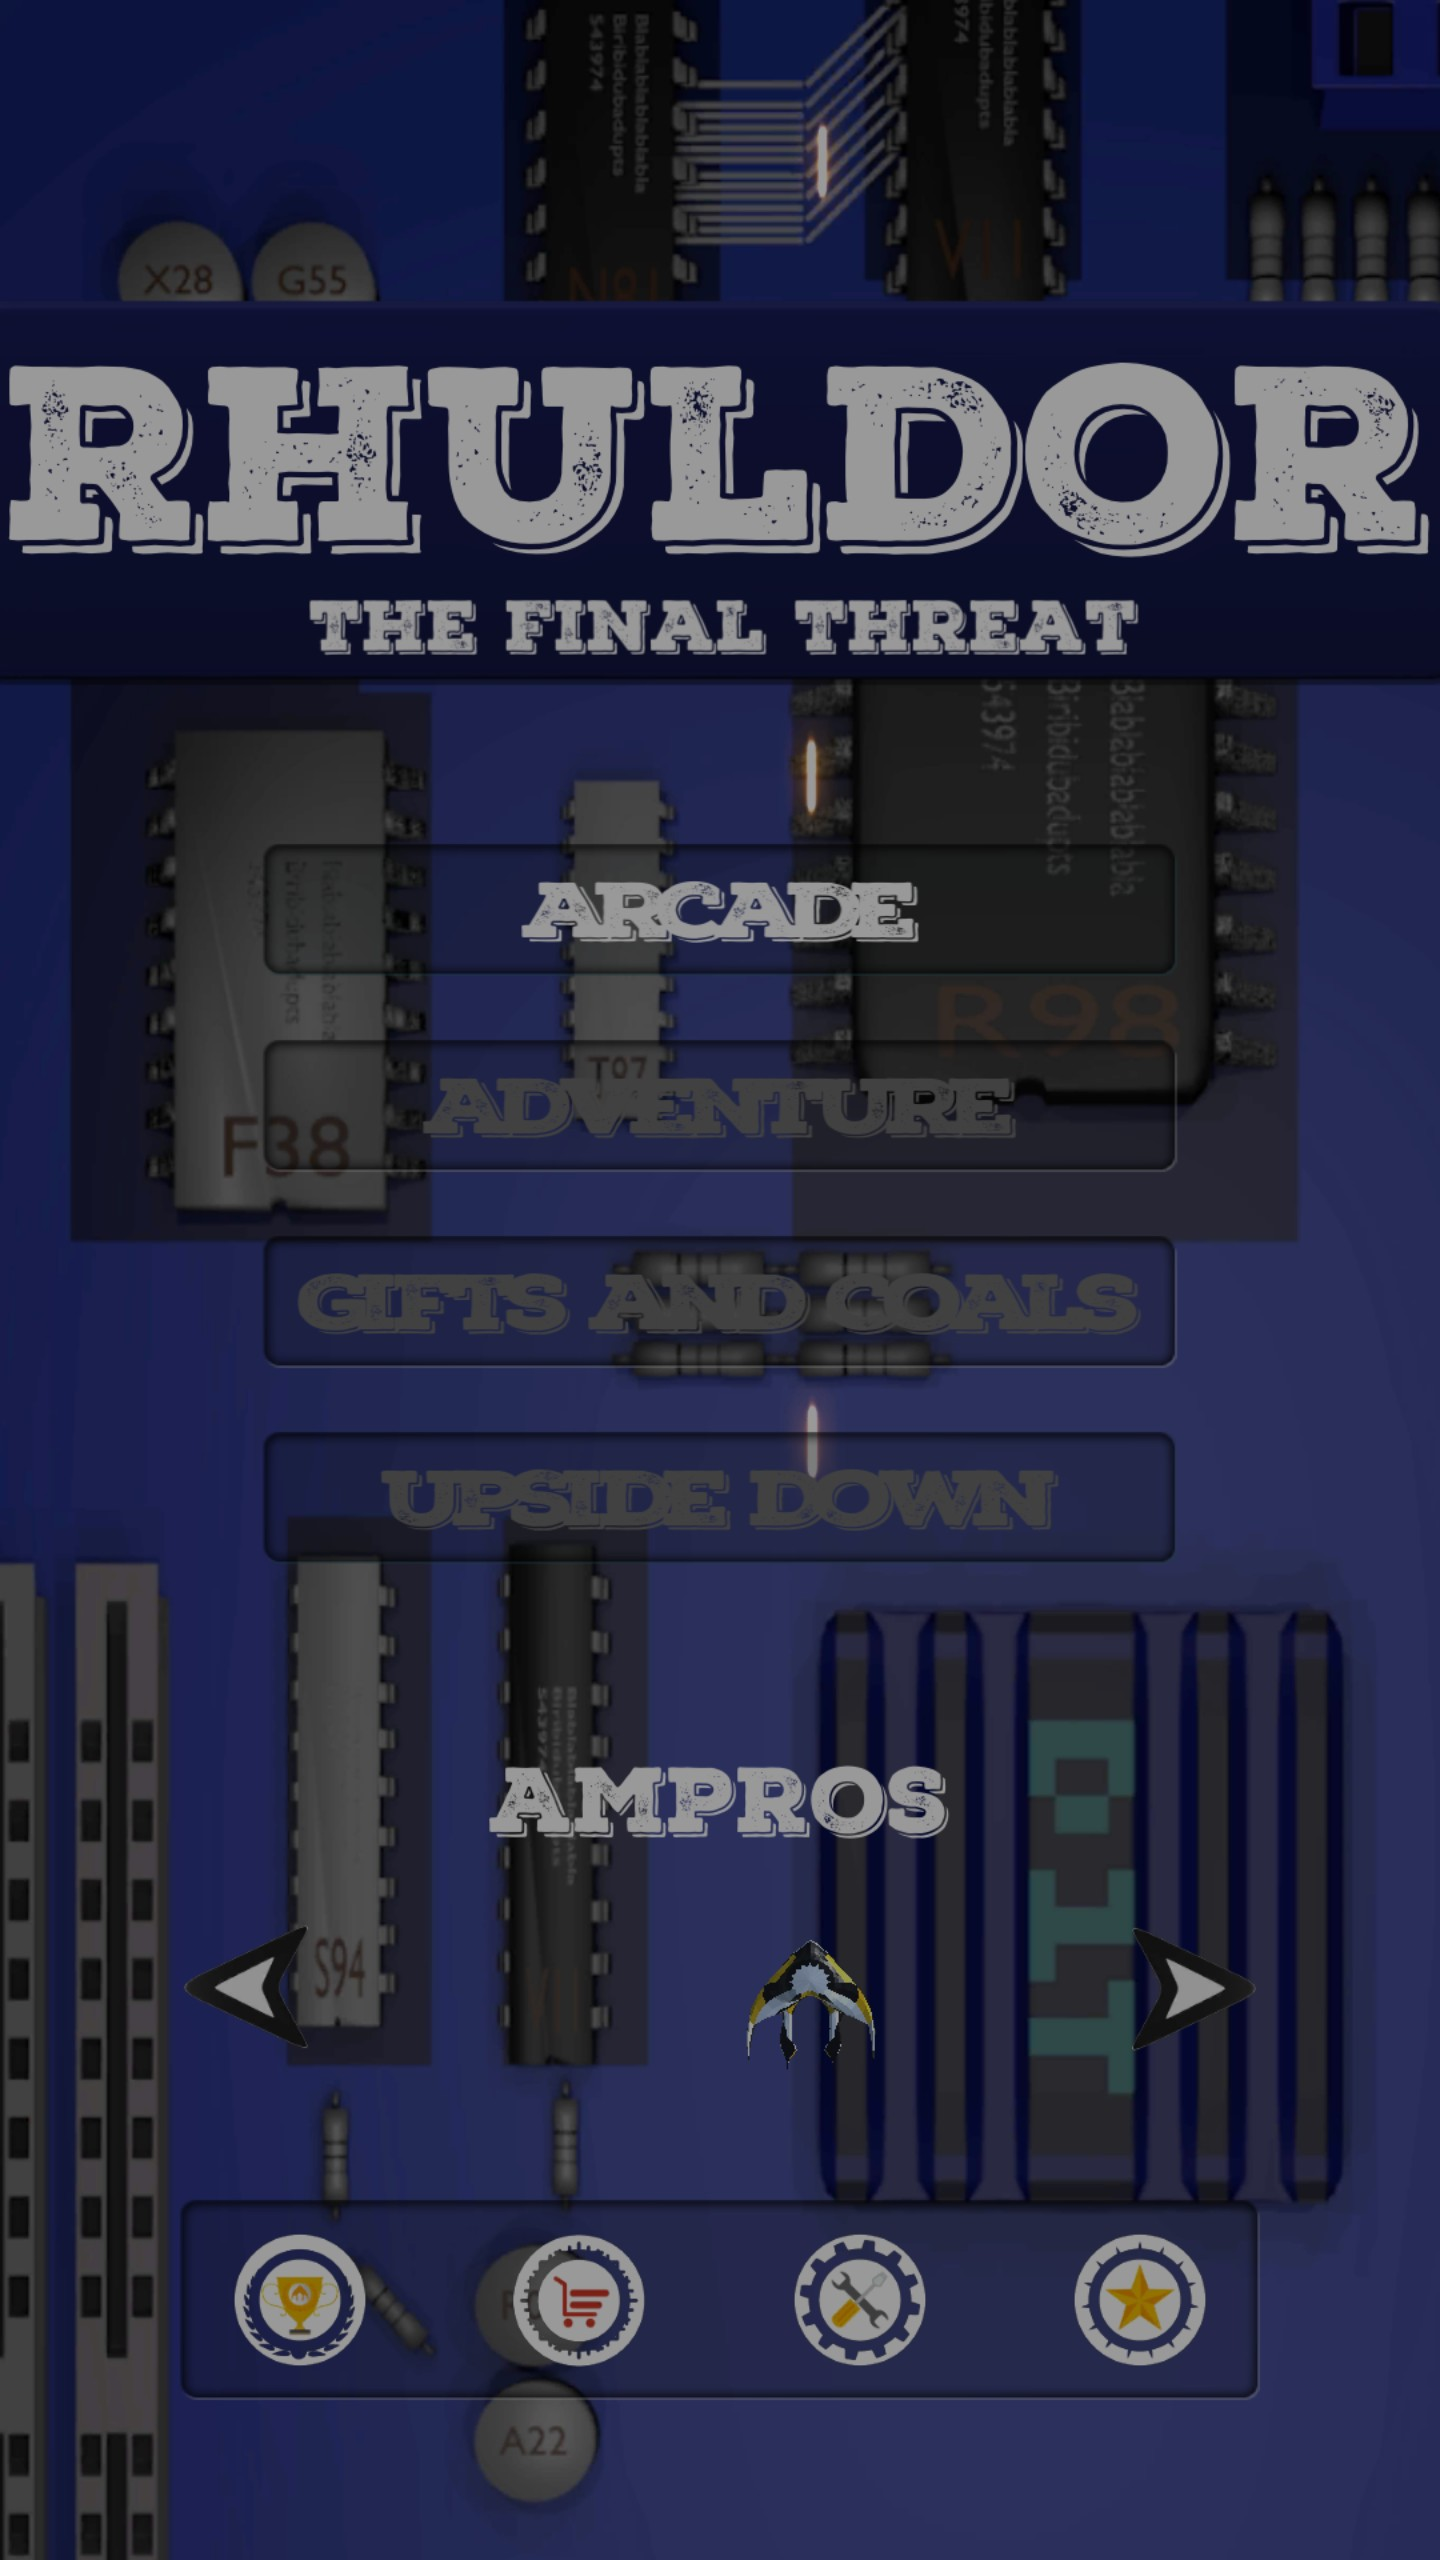 Rhuldor - The Final Threat